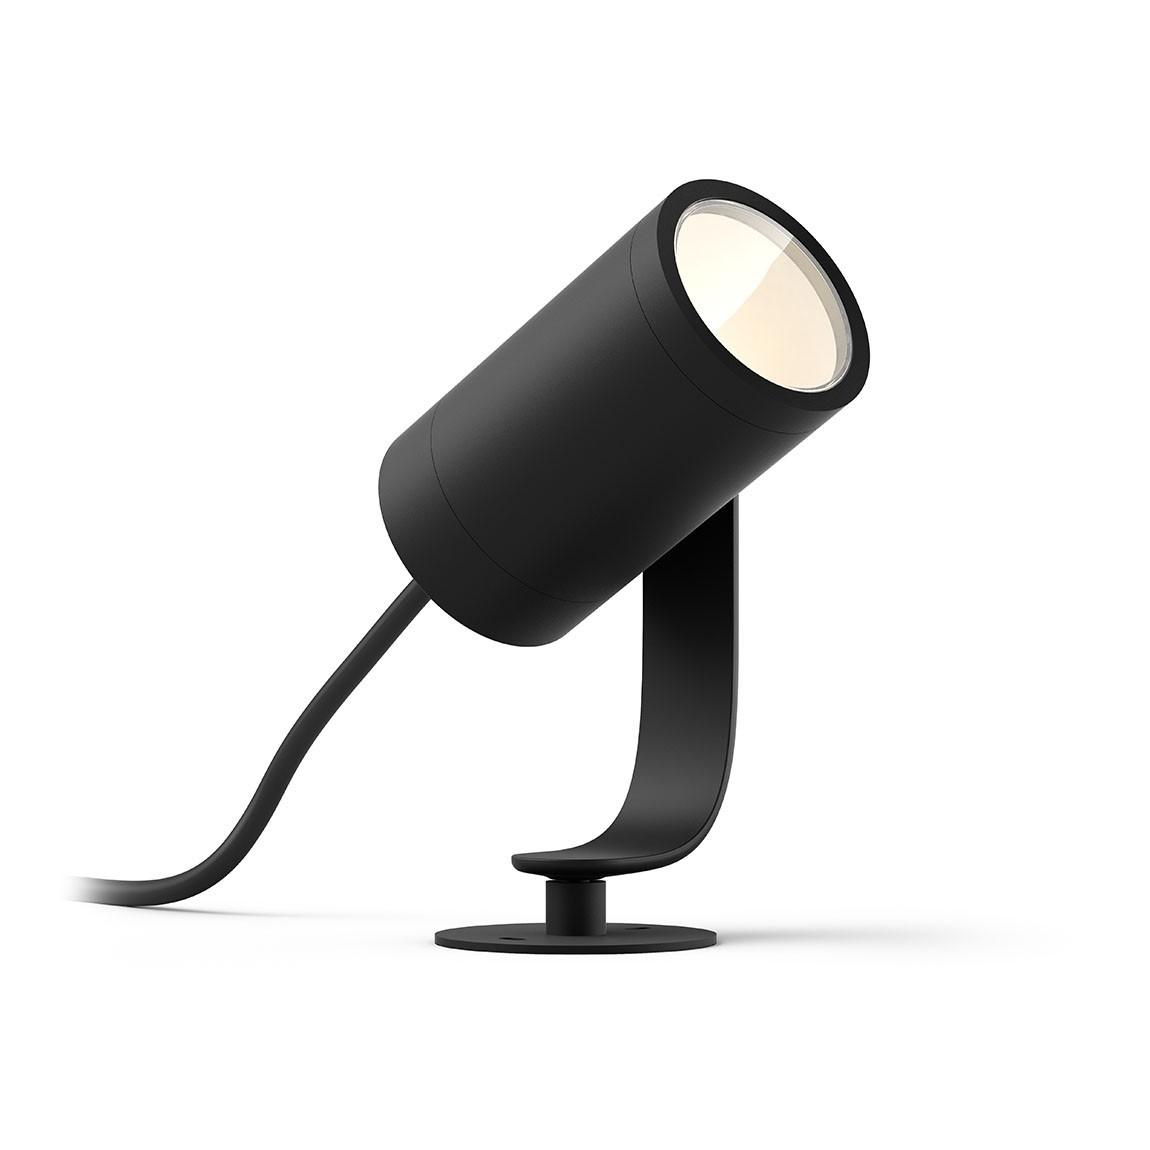 Philips Hue LED Spot Lily 1flg. 700lm Base Kit - Schwarz